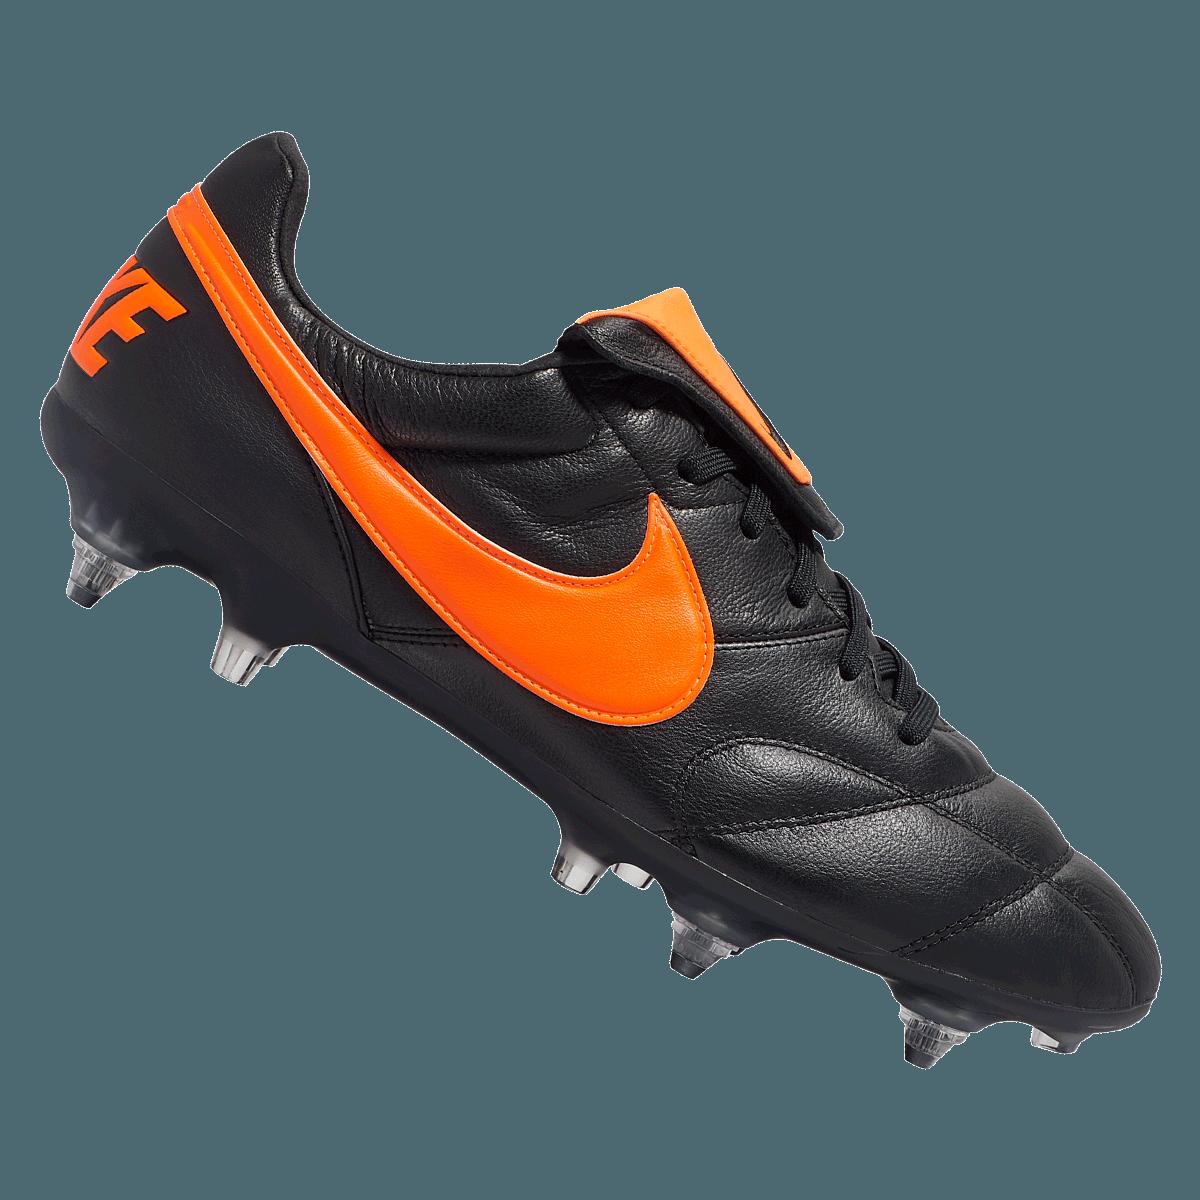 Nike Fussballschuh The Nike Premier Ii Sg Pro Ac Schwarz Orange